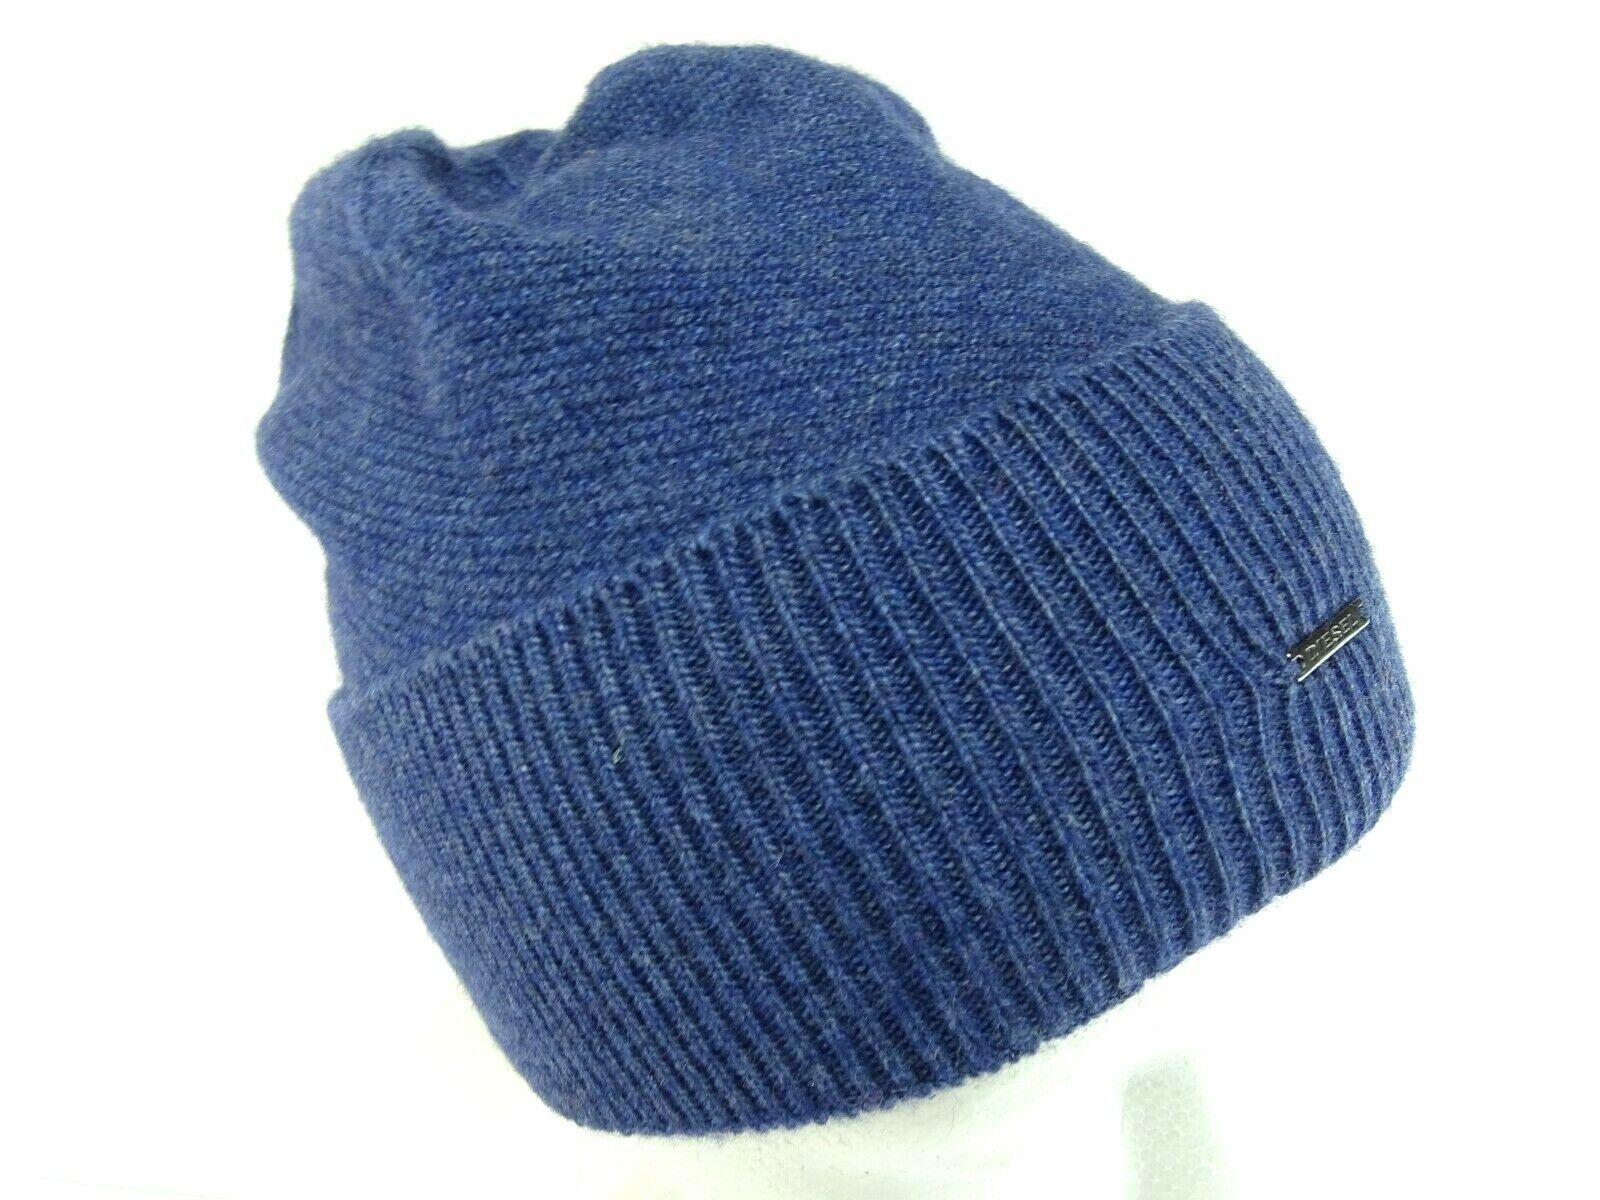 Diesel K-Baty Berretto fleecemütze Winter Hat Beanie Hat Mens Ladies